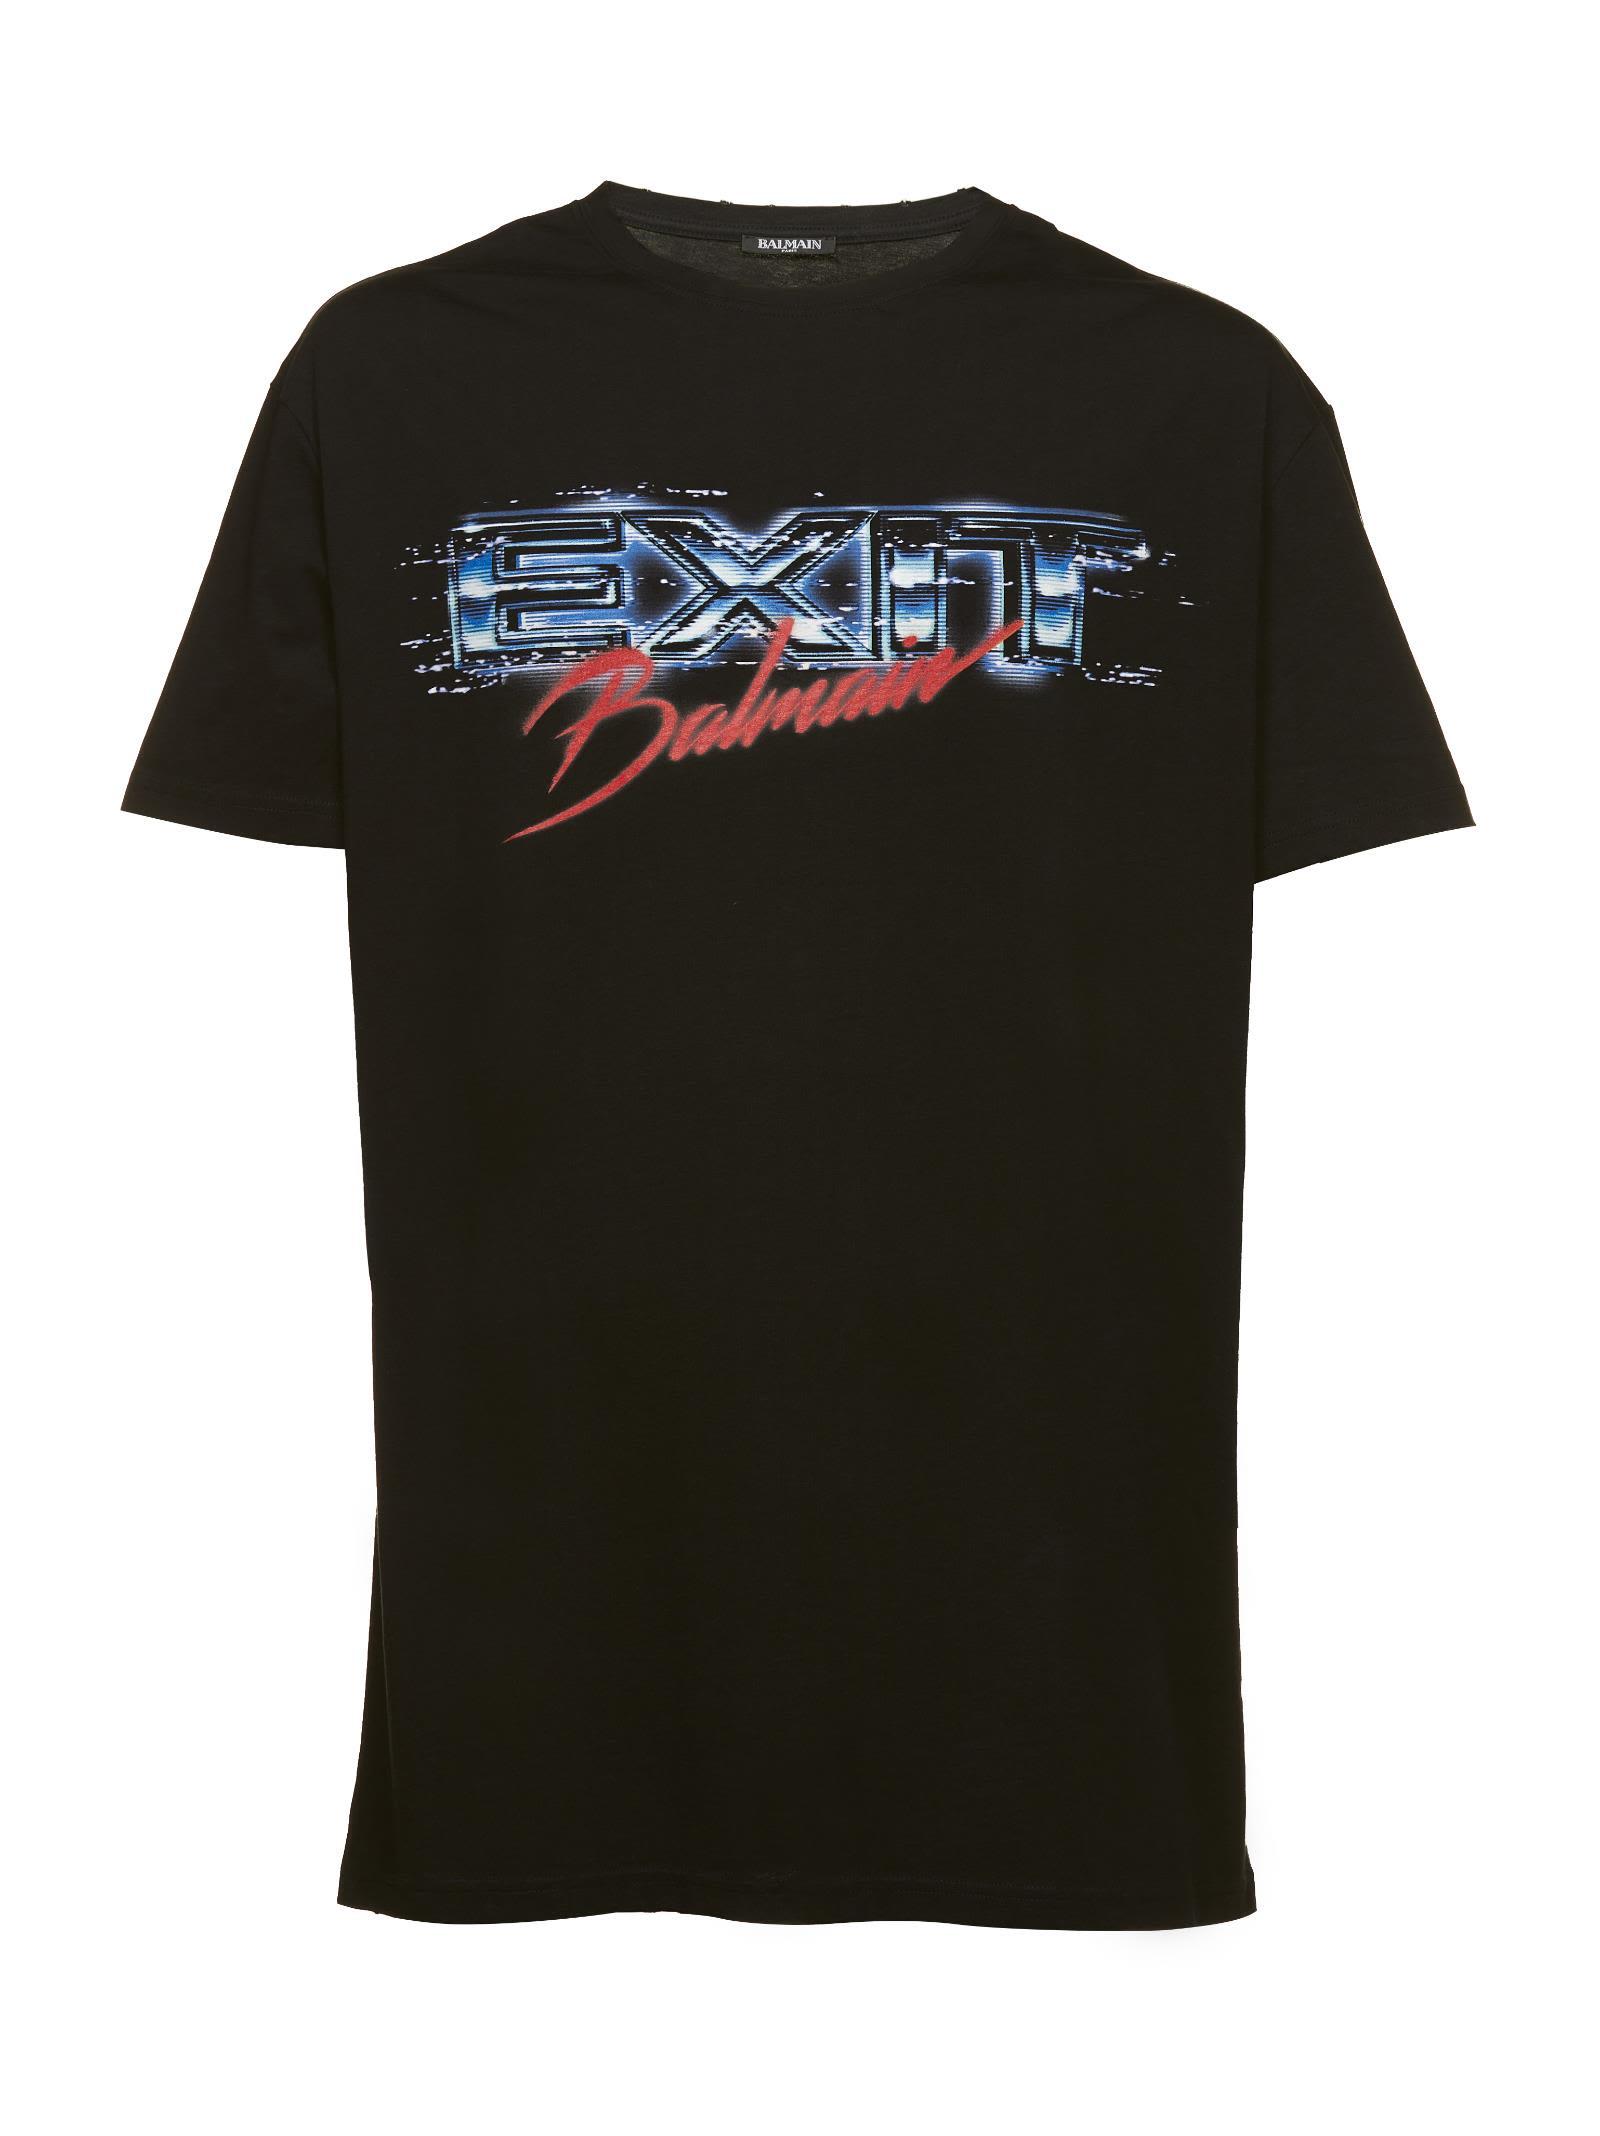 Oversized T-shirt From Balmain: Black Oversized T-shirt With Round Neck, Short Sleeves, Printed Deta